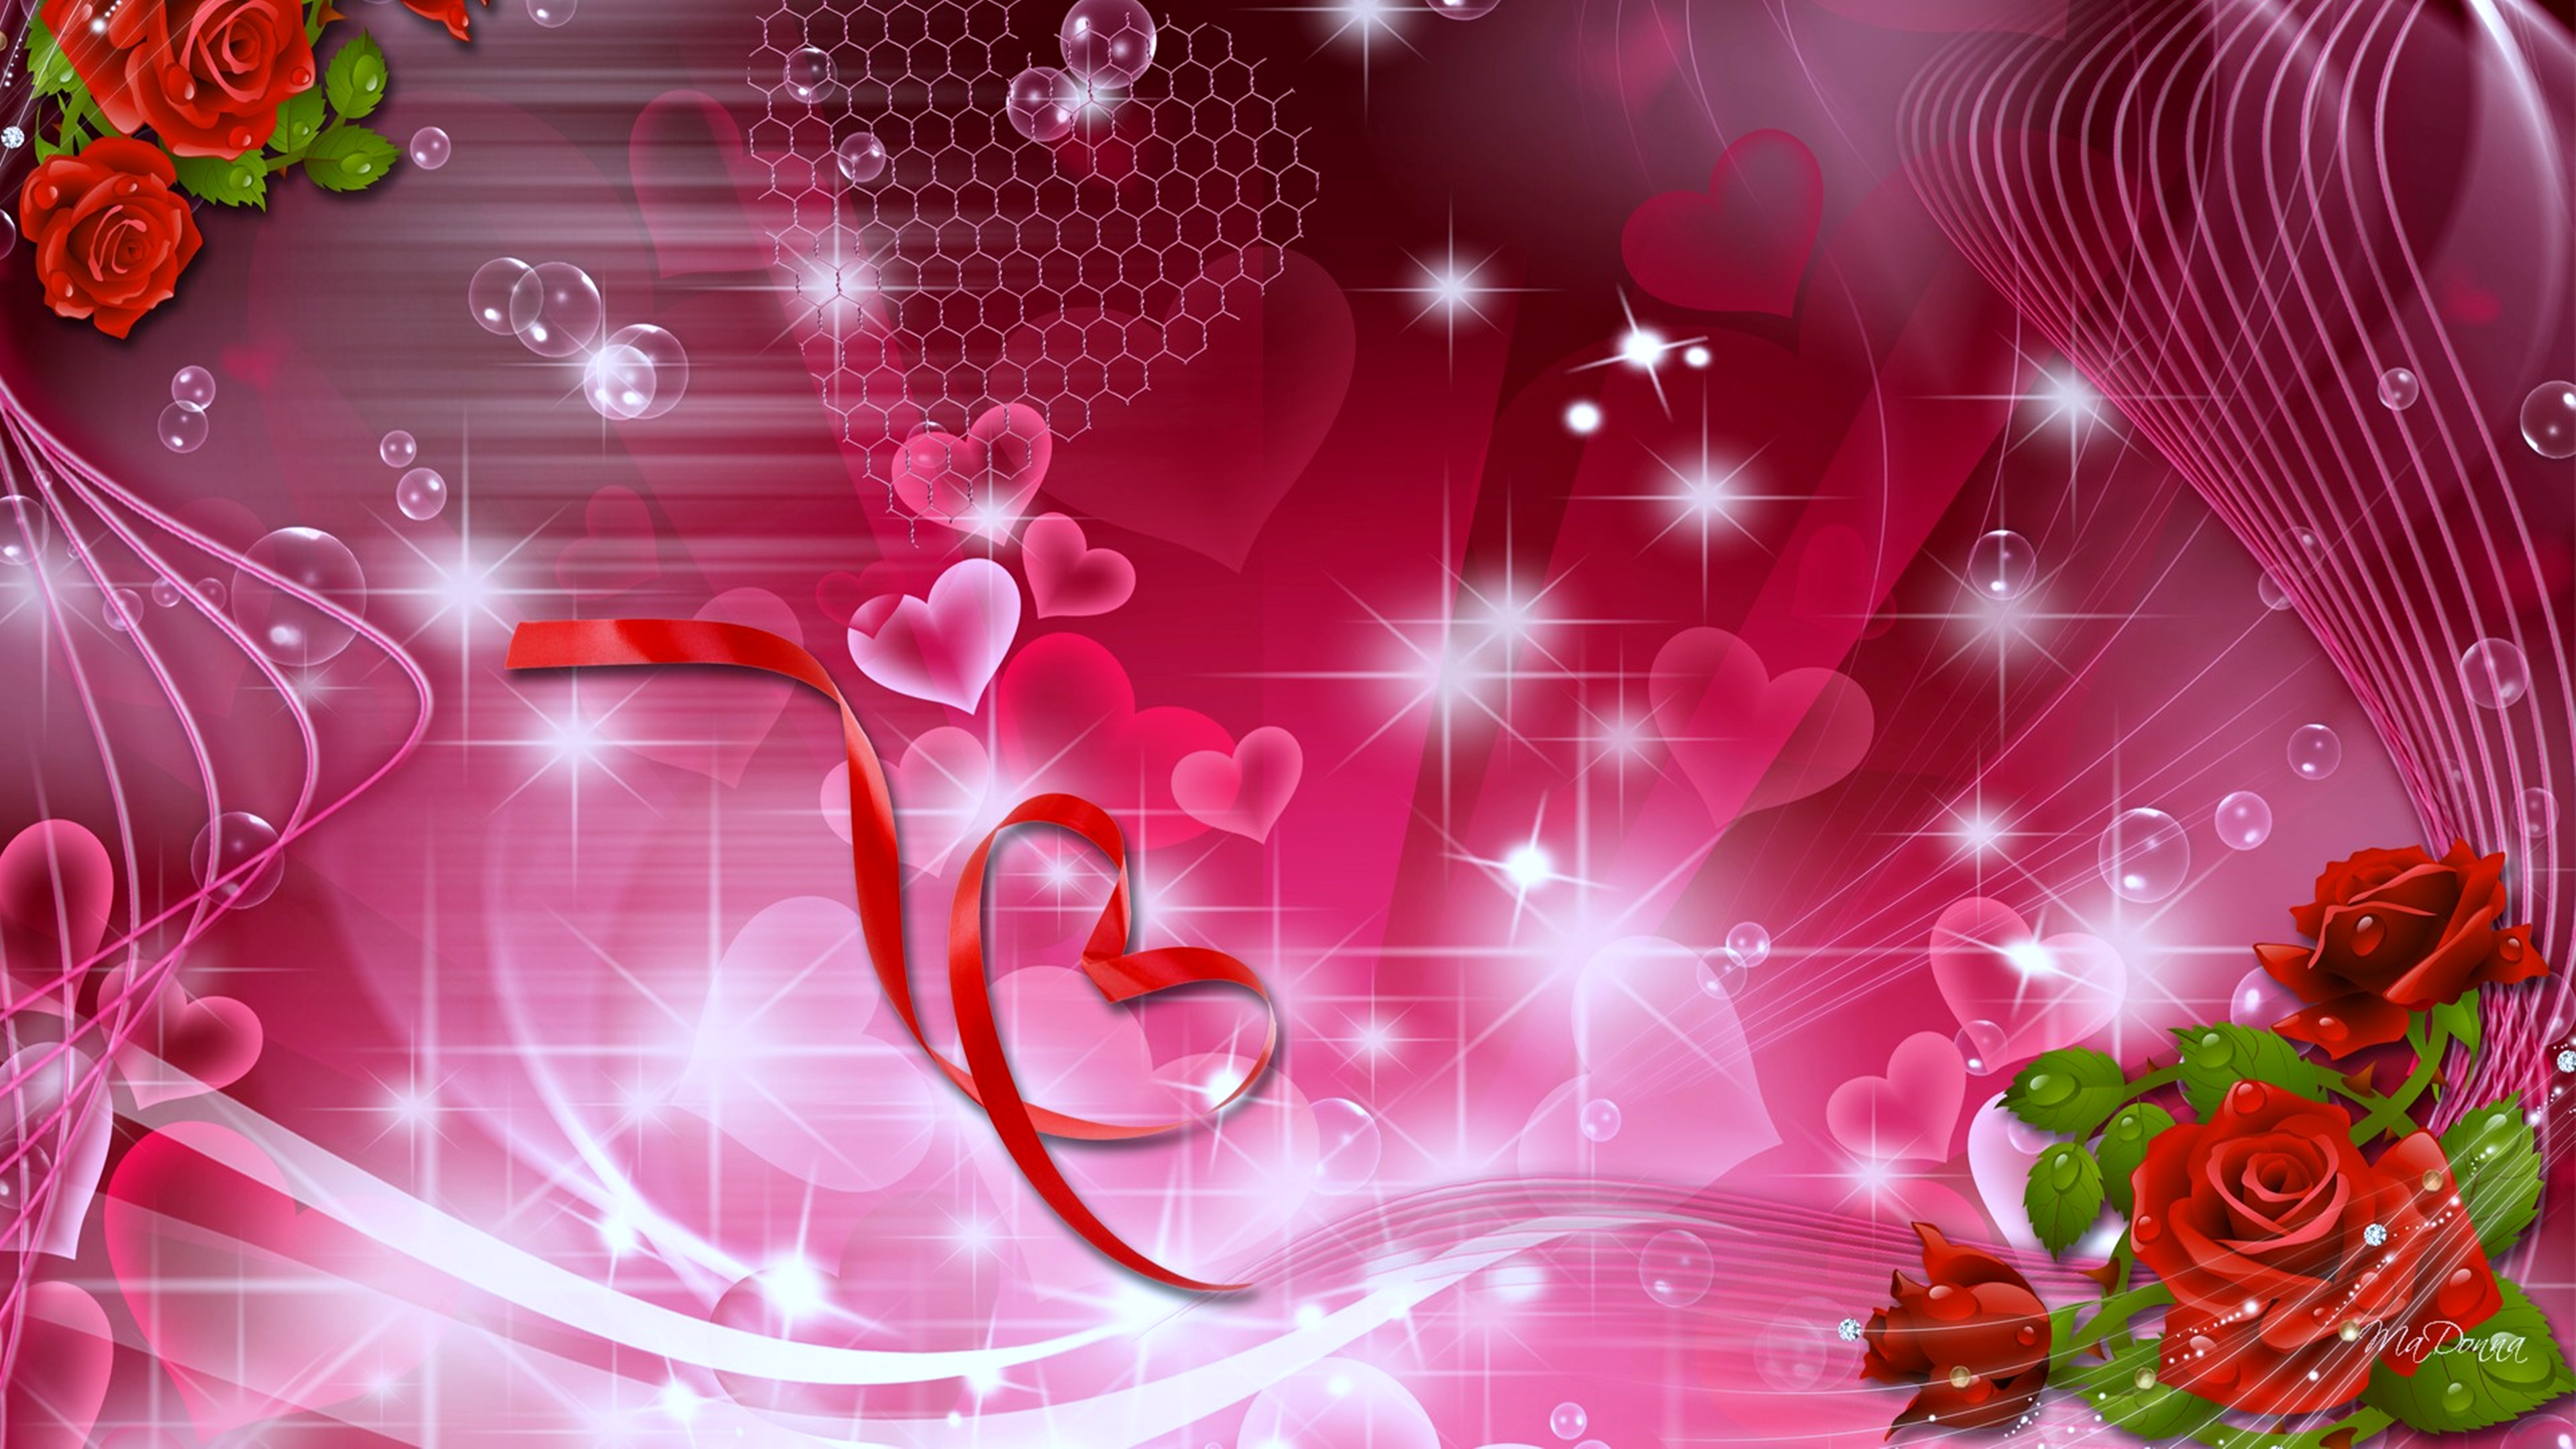 Love Wallpapers In Portuguese : Artistic Love Romance Heart Rose Wallpaper